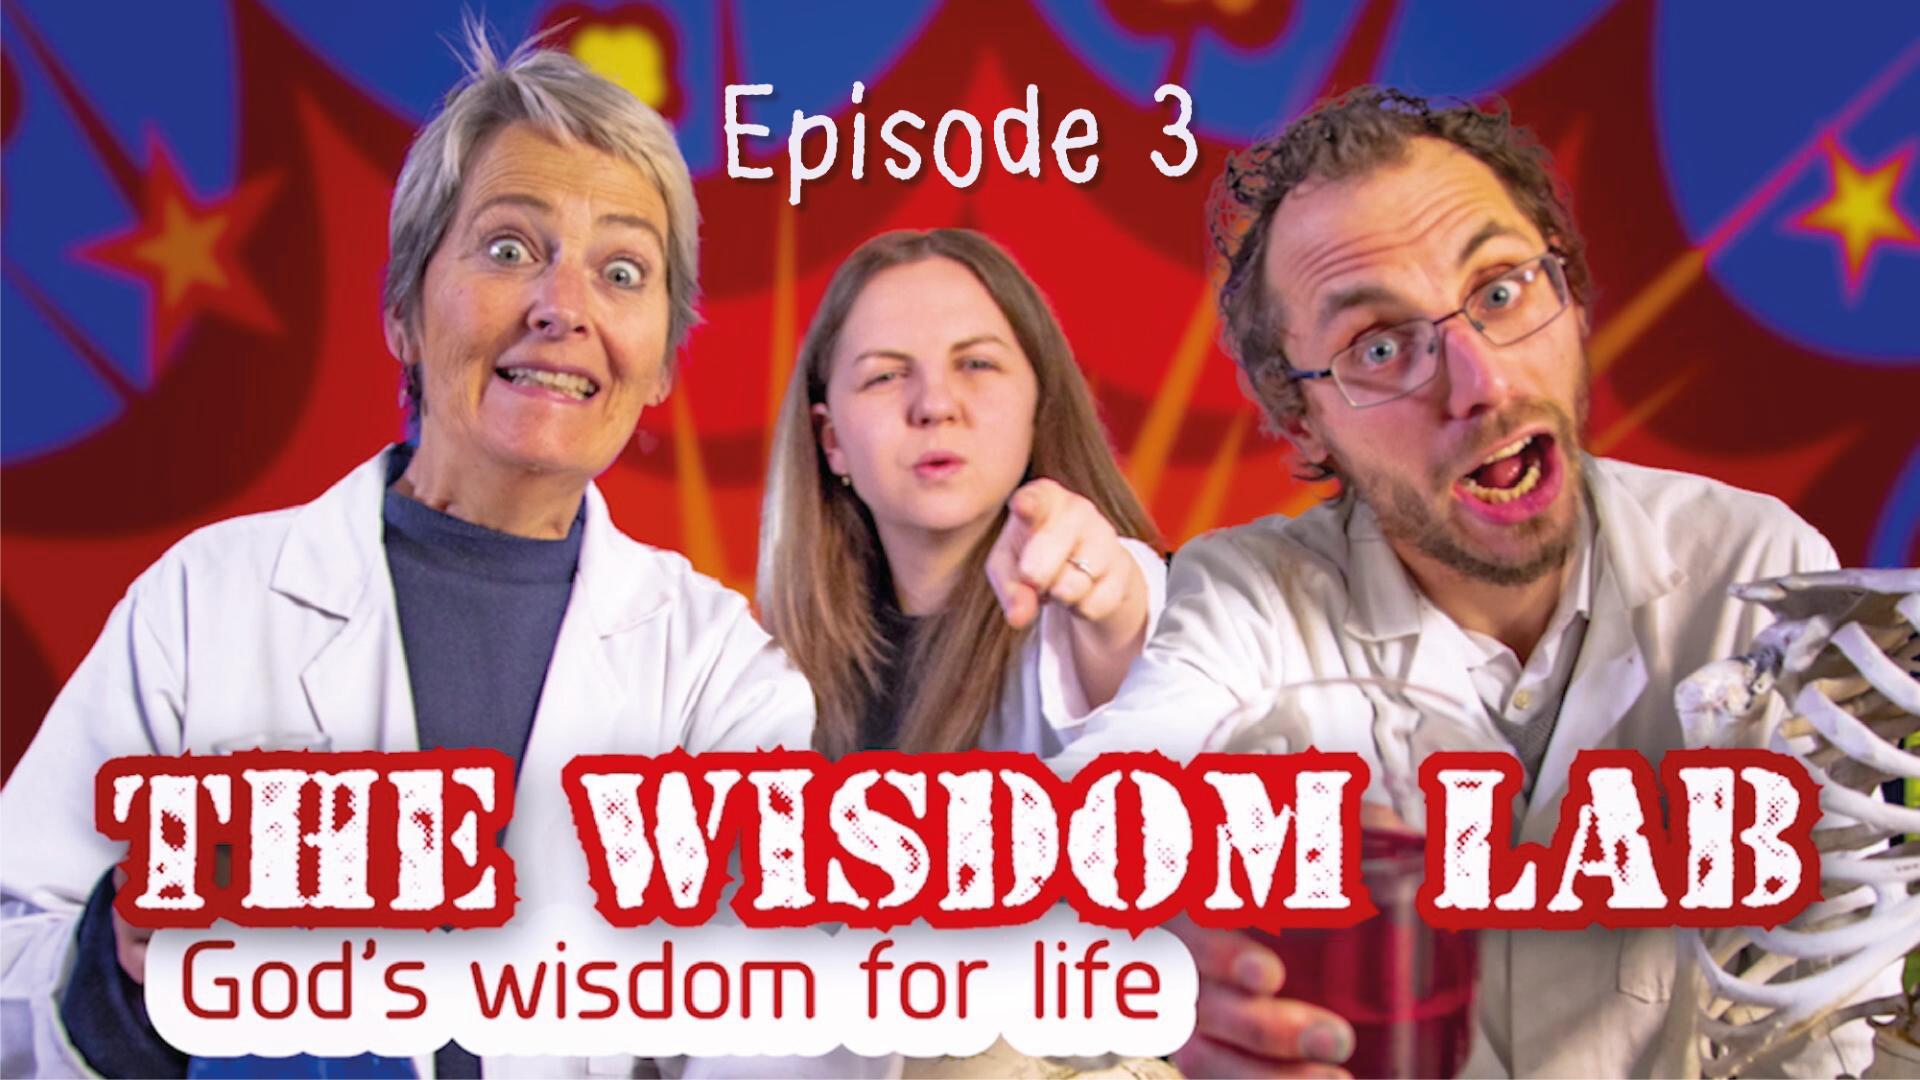 The Wisdom Lab: Episode 3